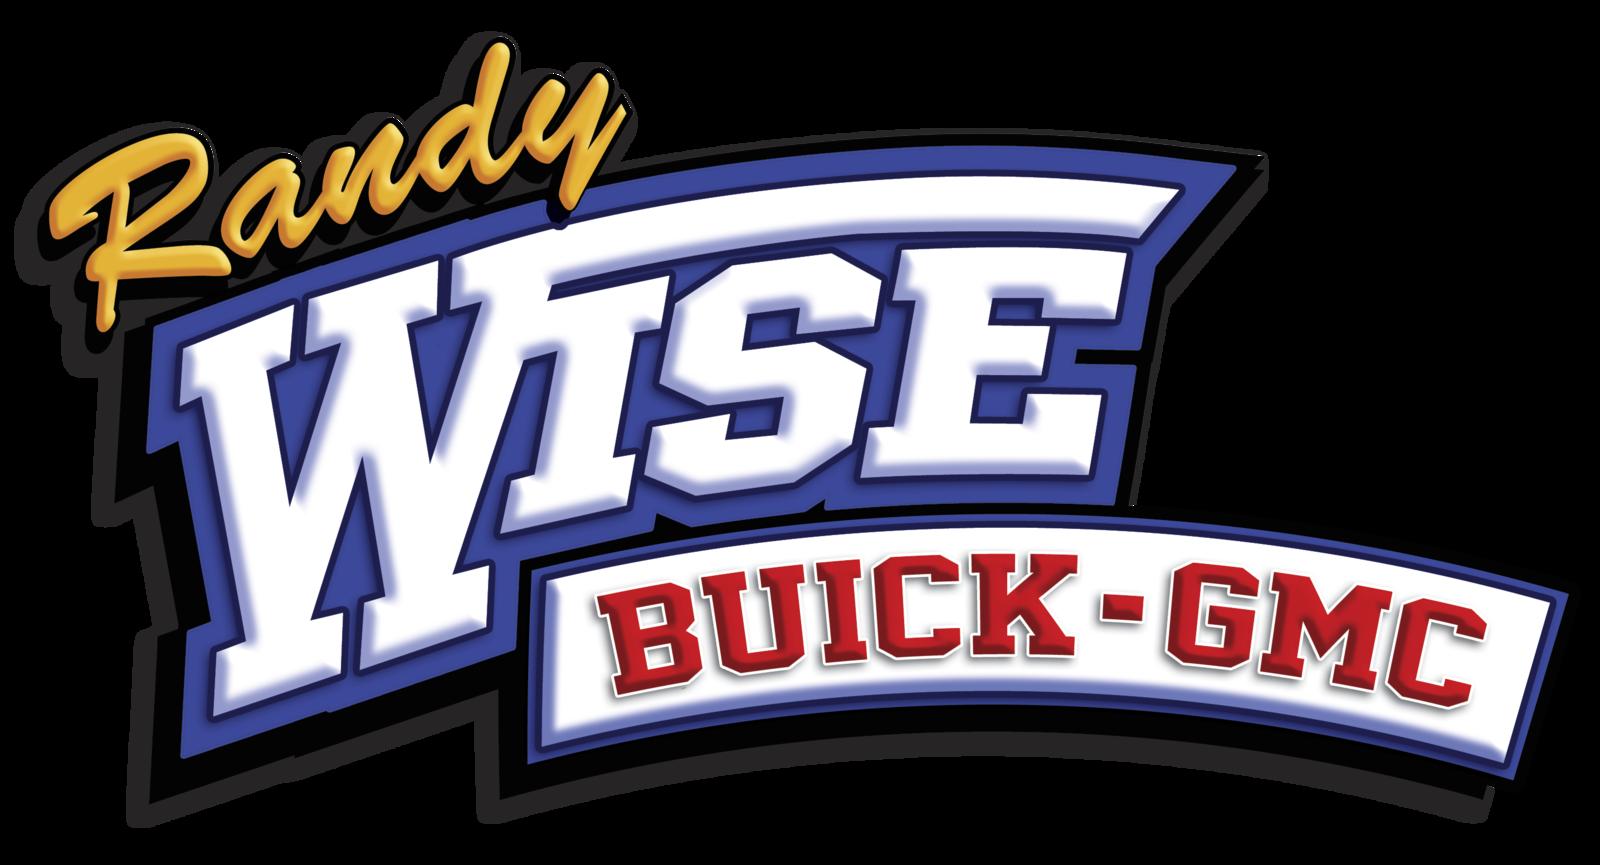 Randy Wise Fenton >> Randy Wise Buick GMC - Fenton, MI: Read Consumer reviews